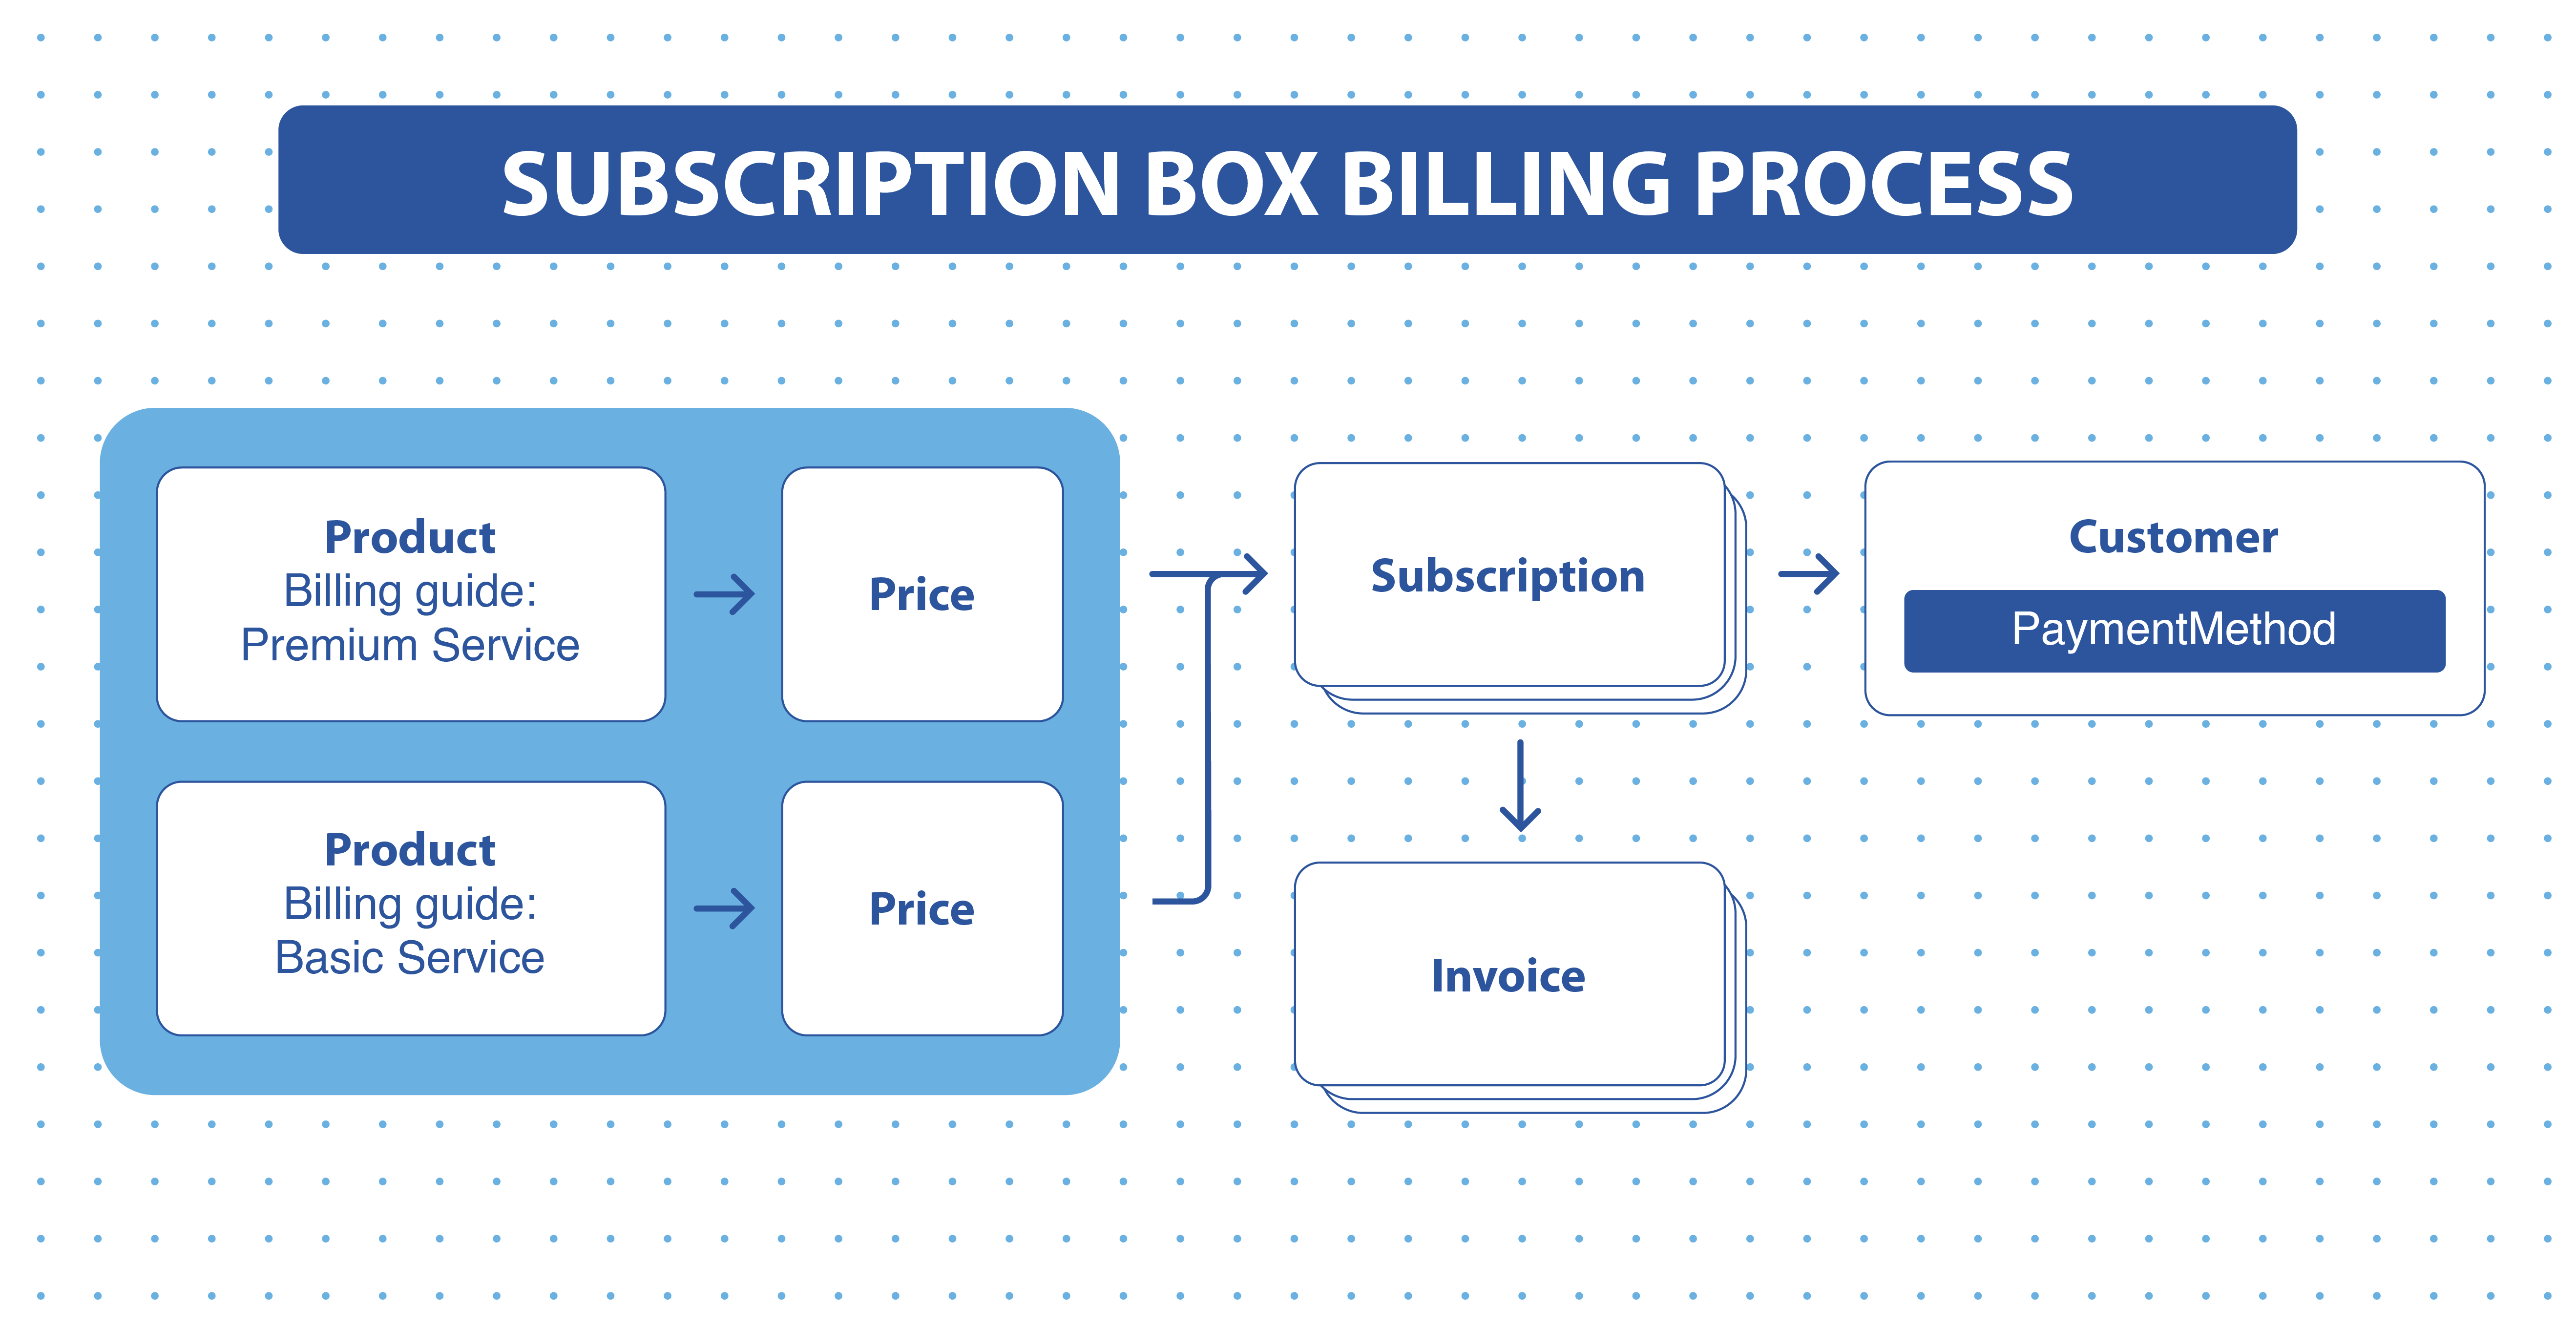 Subscription Box Billing Process